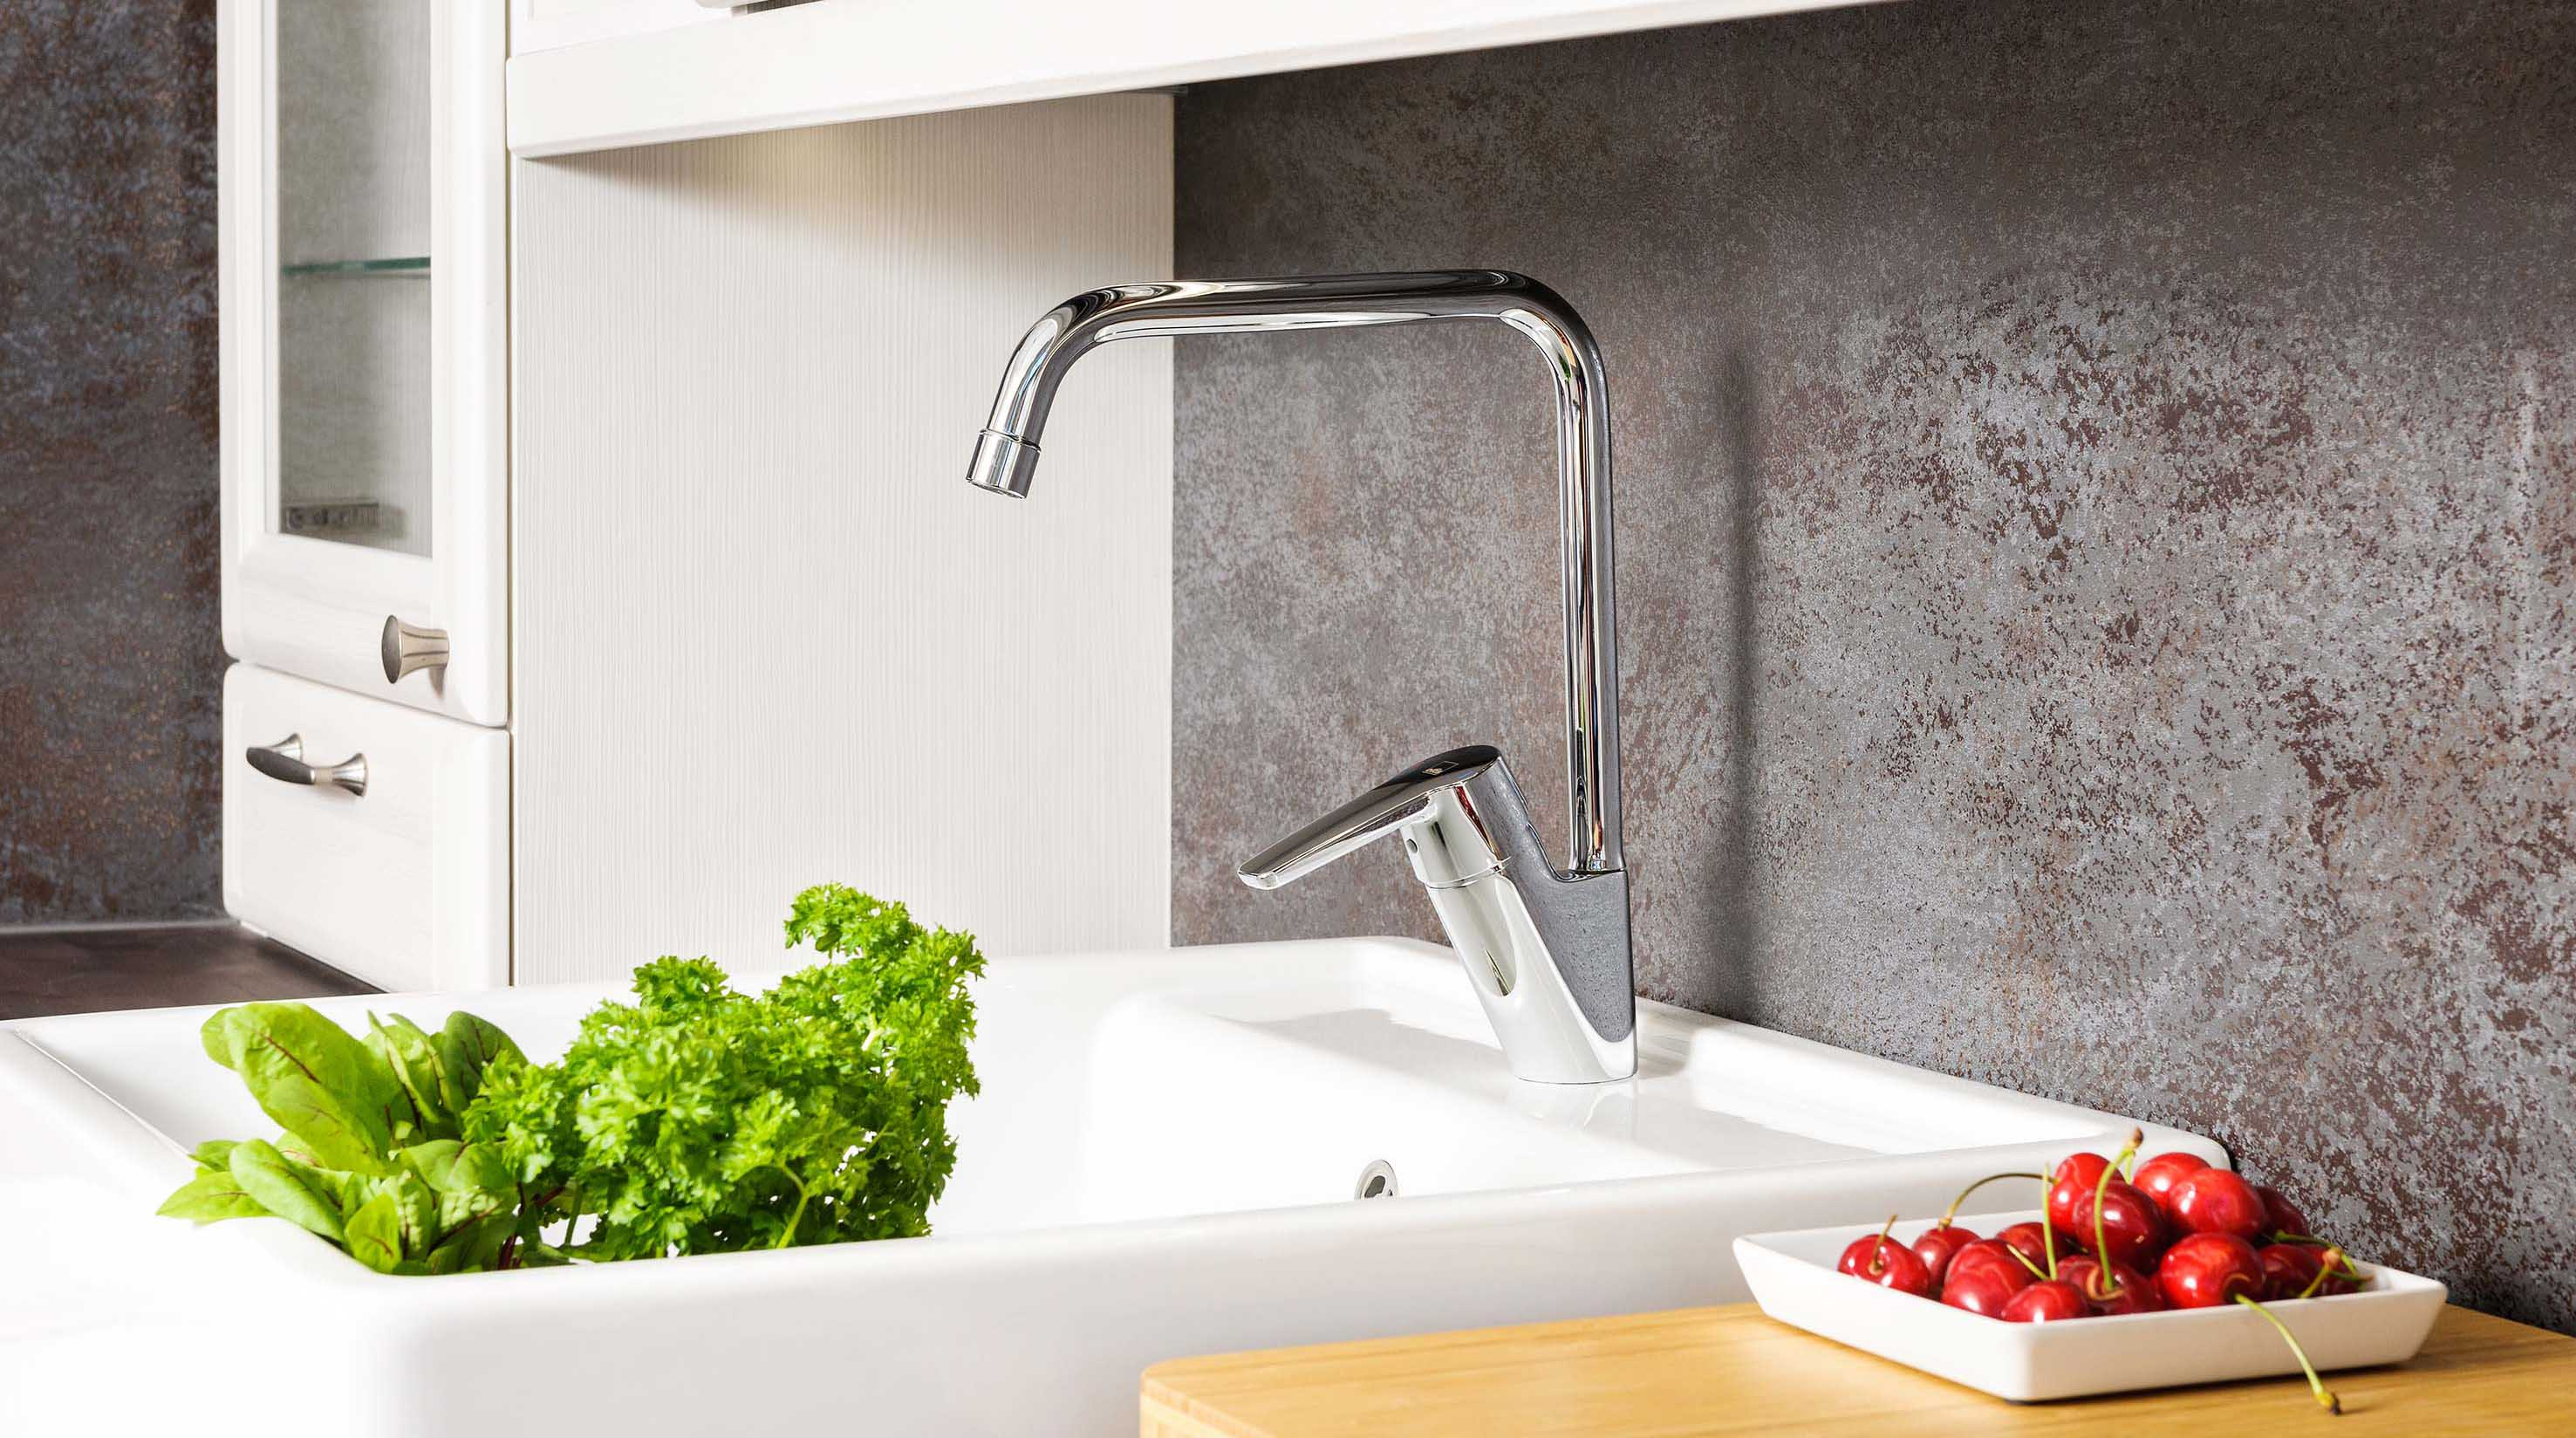 Nya_Oras_Swea_kitchen_interior_1